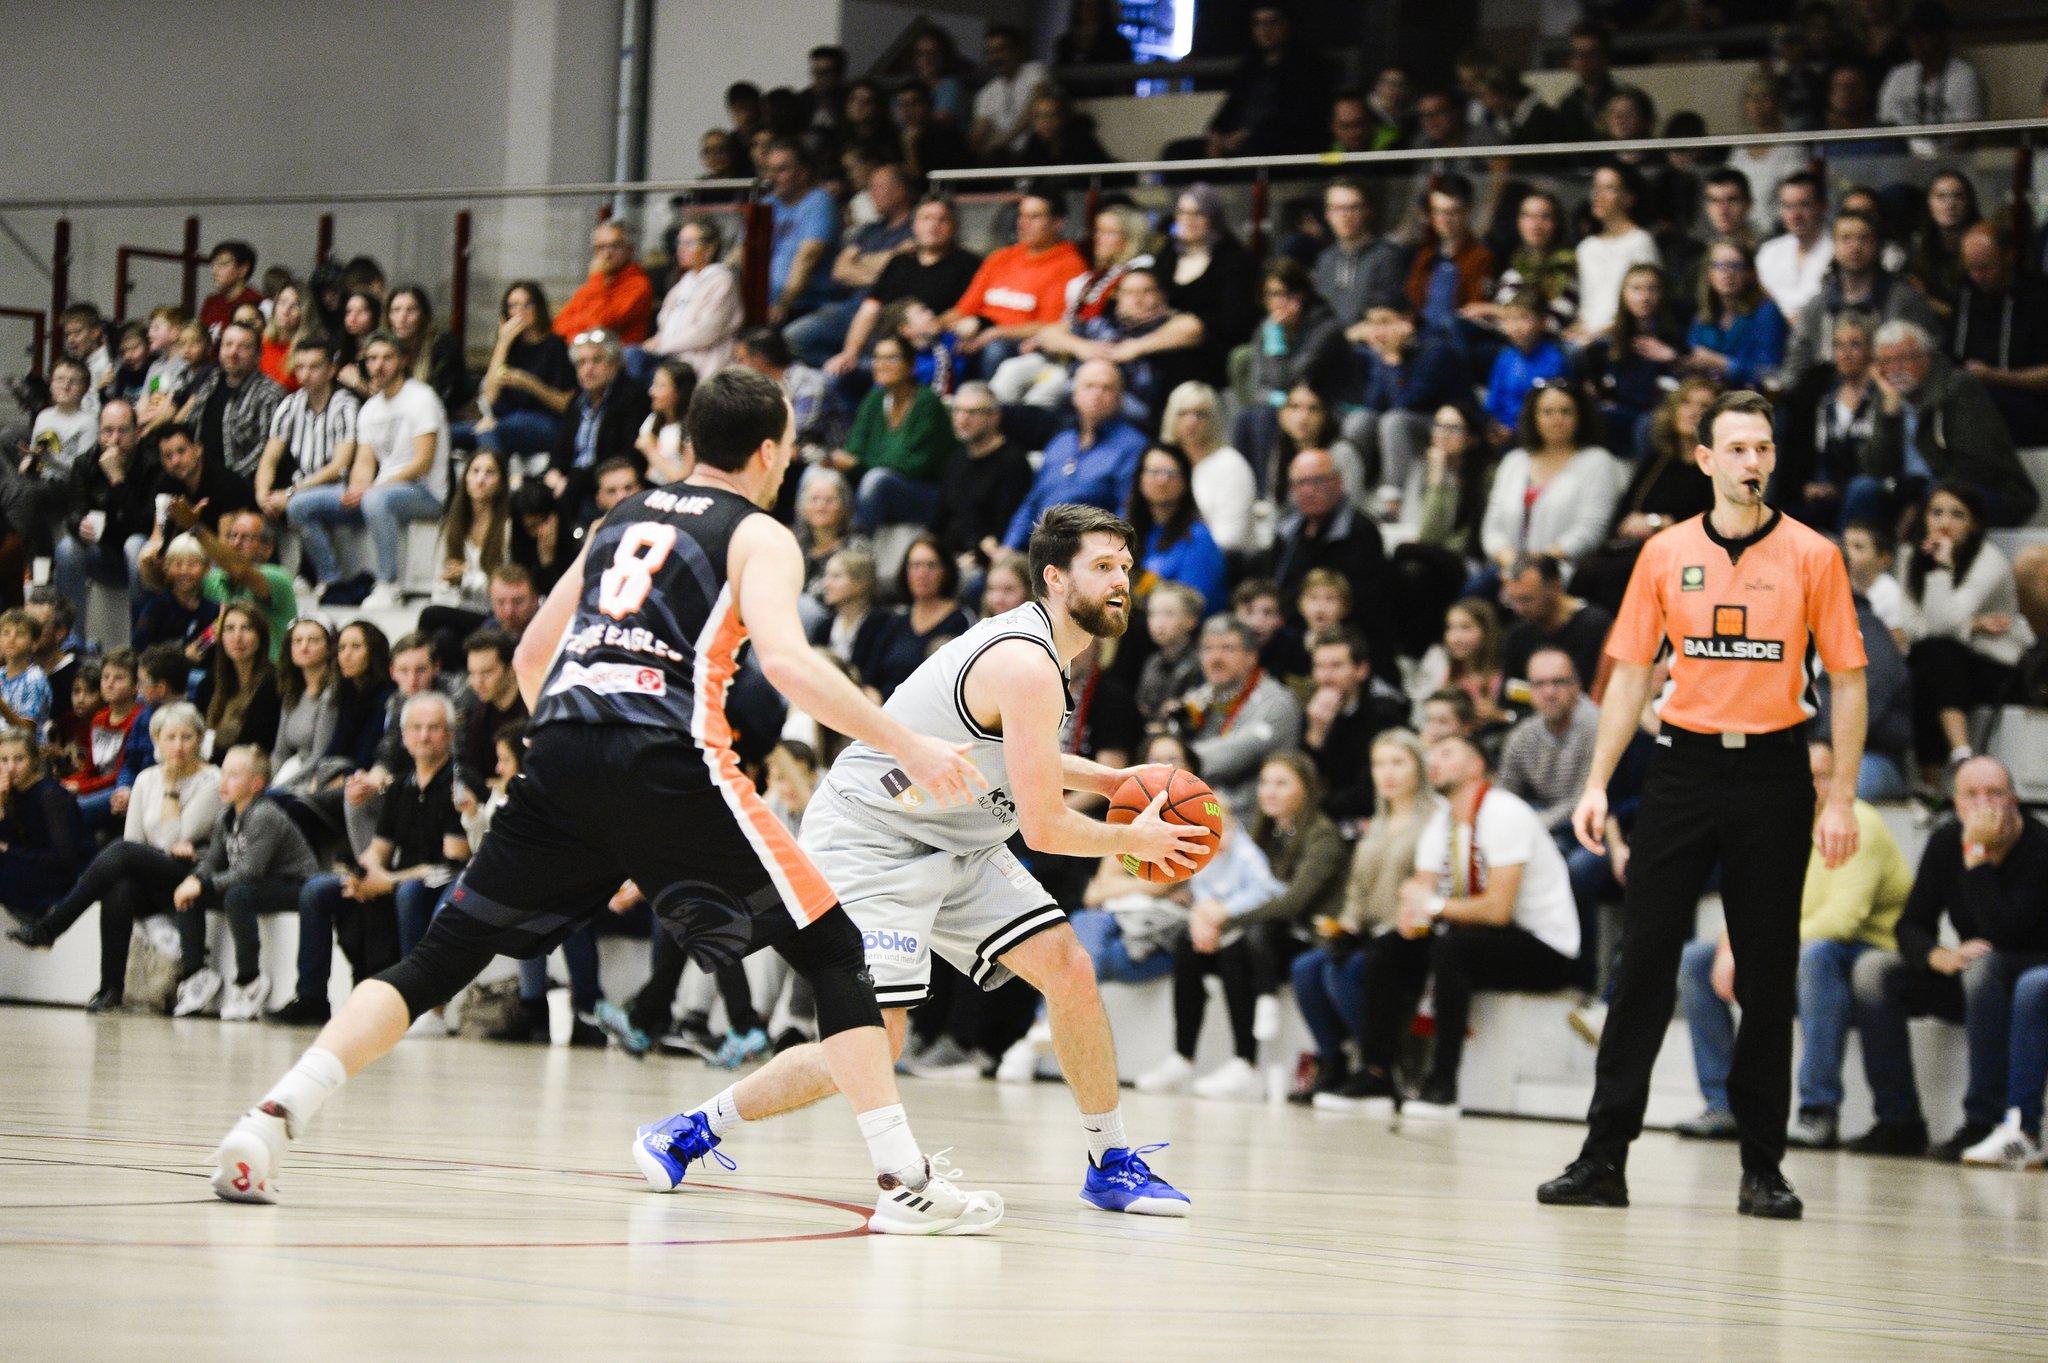 Basketball Iserlohn